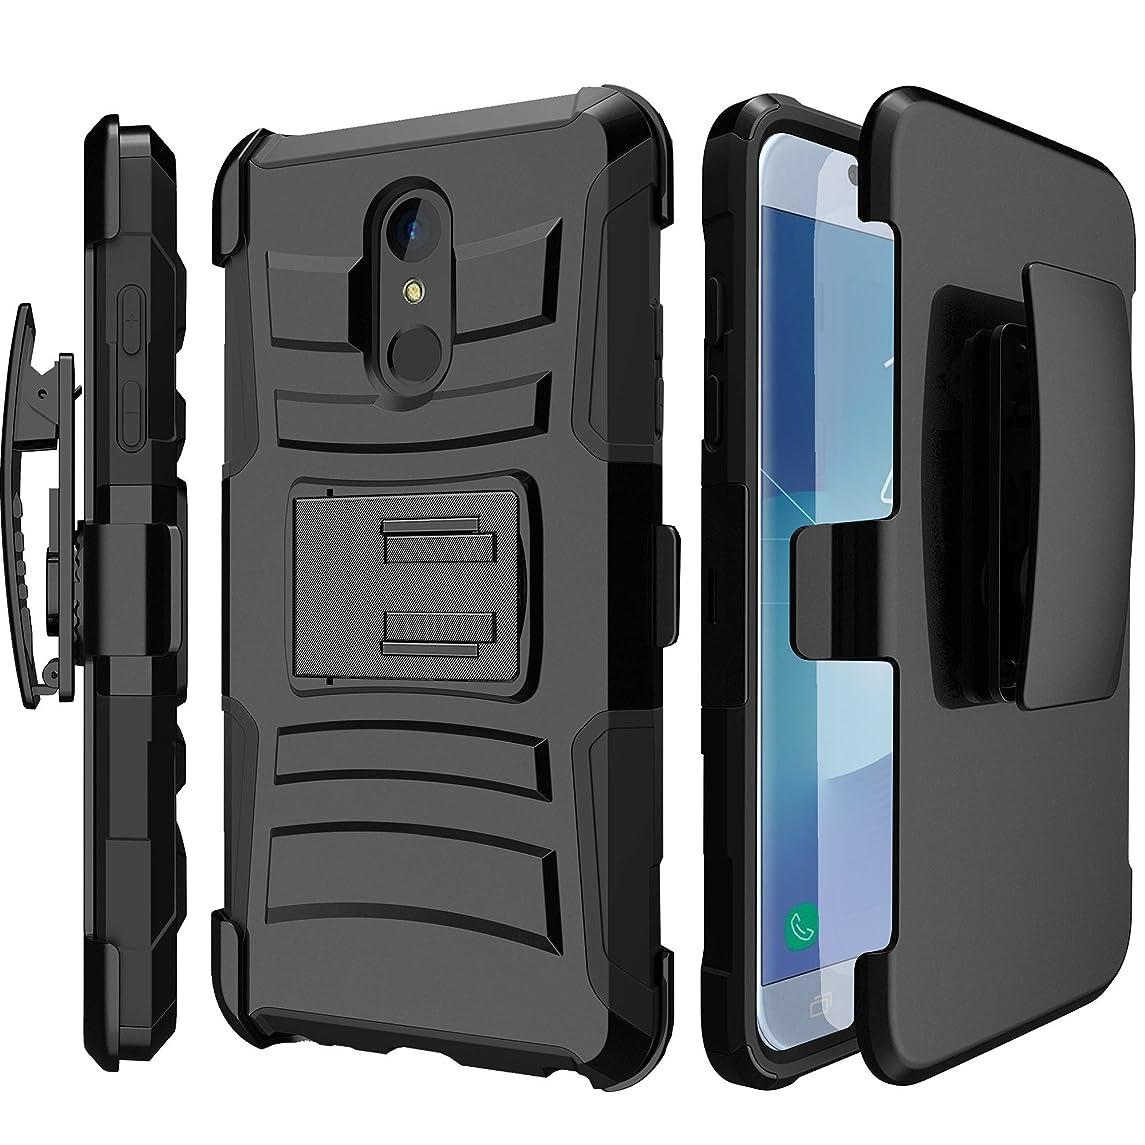 MINITURTLE Clip Case Compatible with LG K30 / LG Premier Pro (2018) / Harmony 2 [Clip Armor Case Series] Case with Built in Stand & Bonus Holster Clip Combo - Plain Black